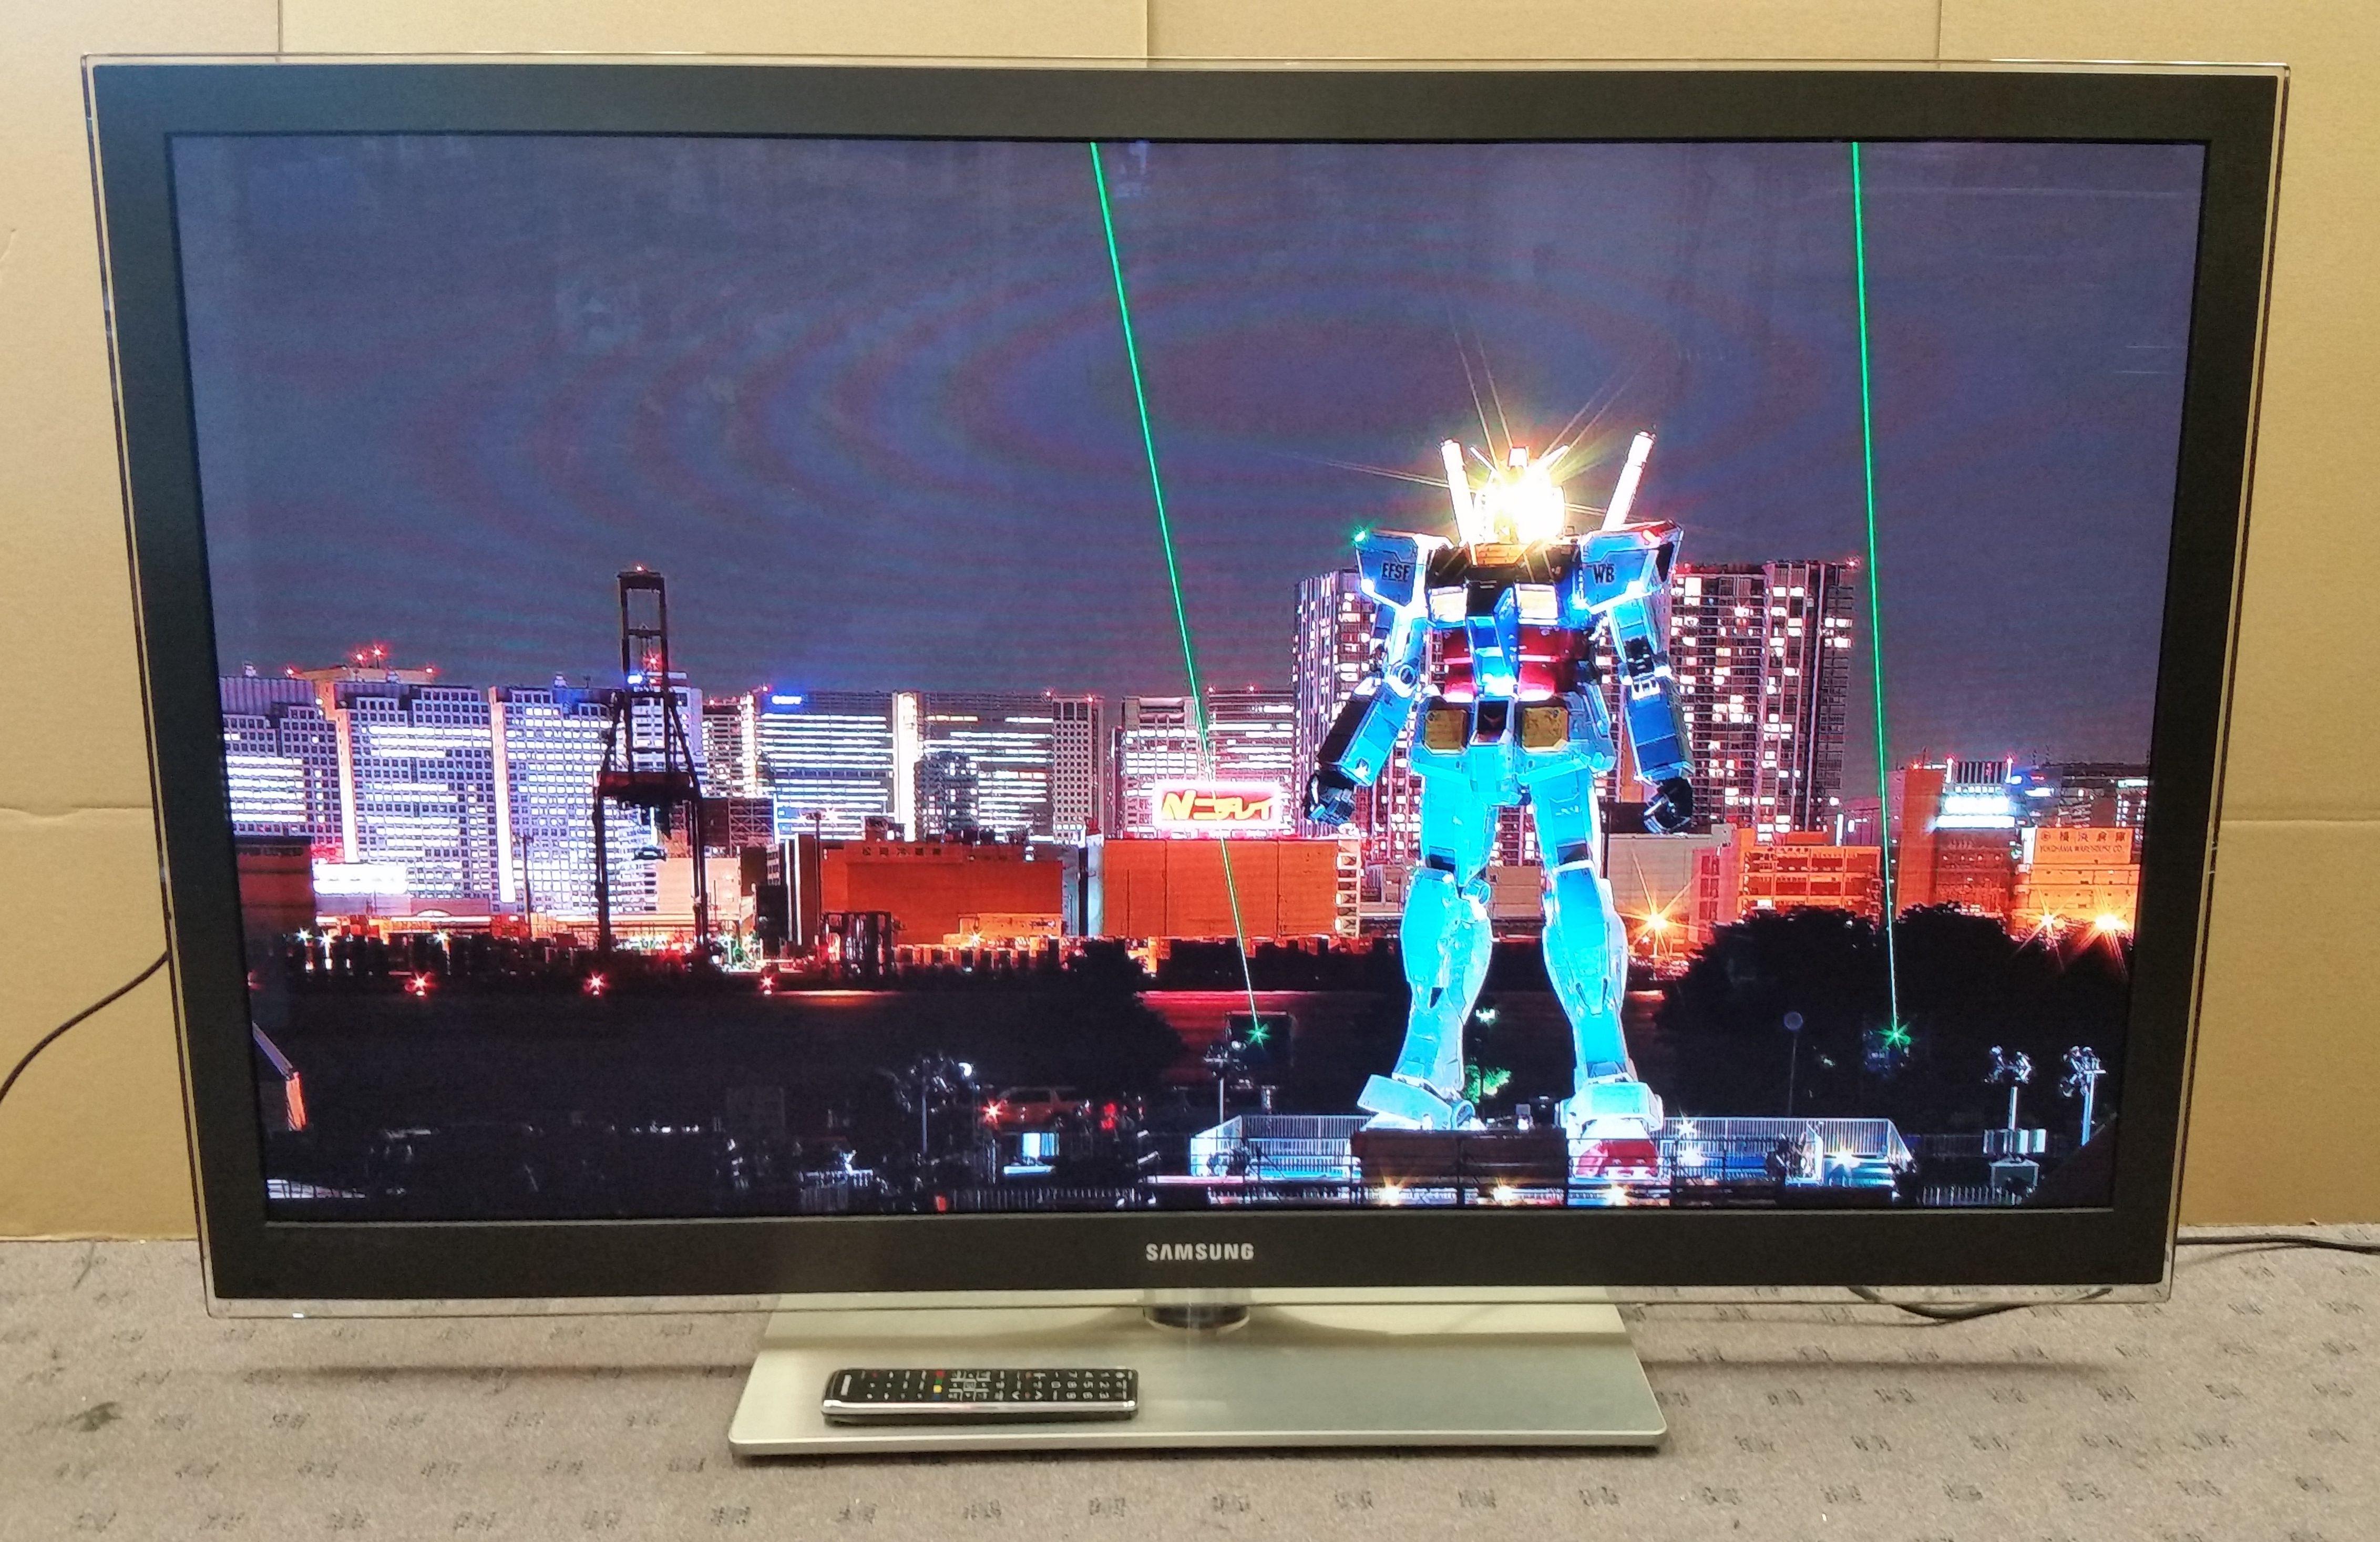 Tv Samsung Pn58c8000yf 58 Fhd Plasma Tv Used Buy Sell Electronics